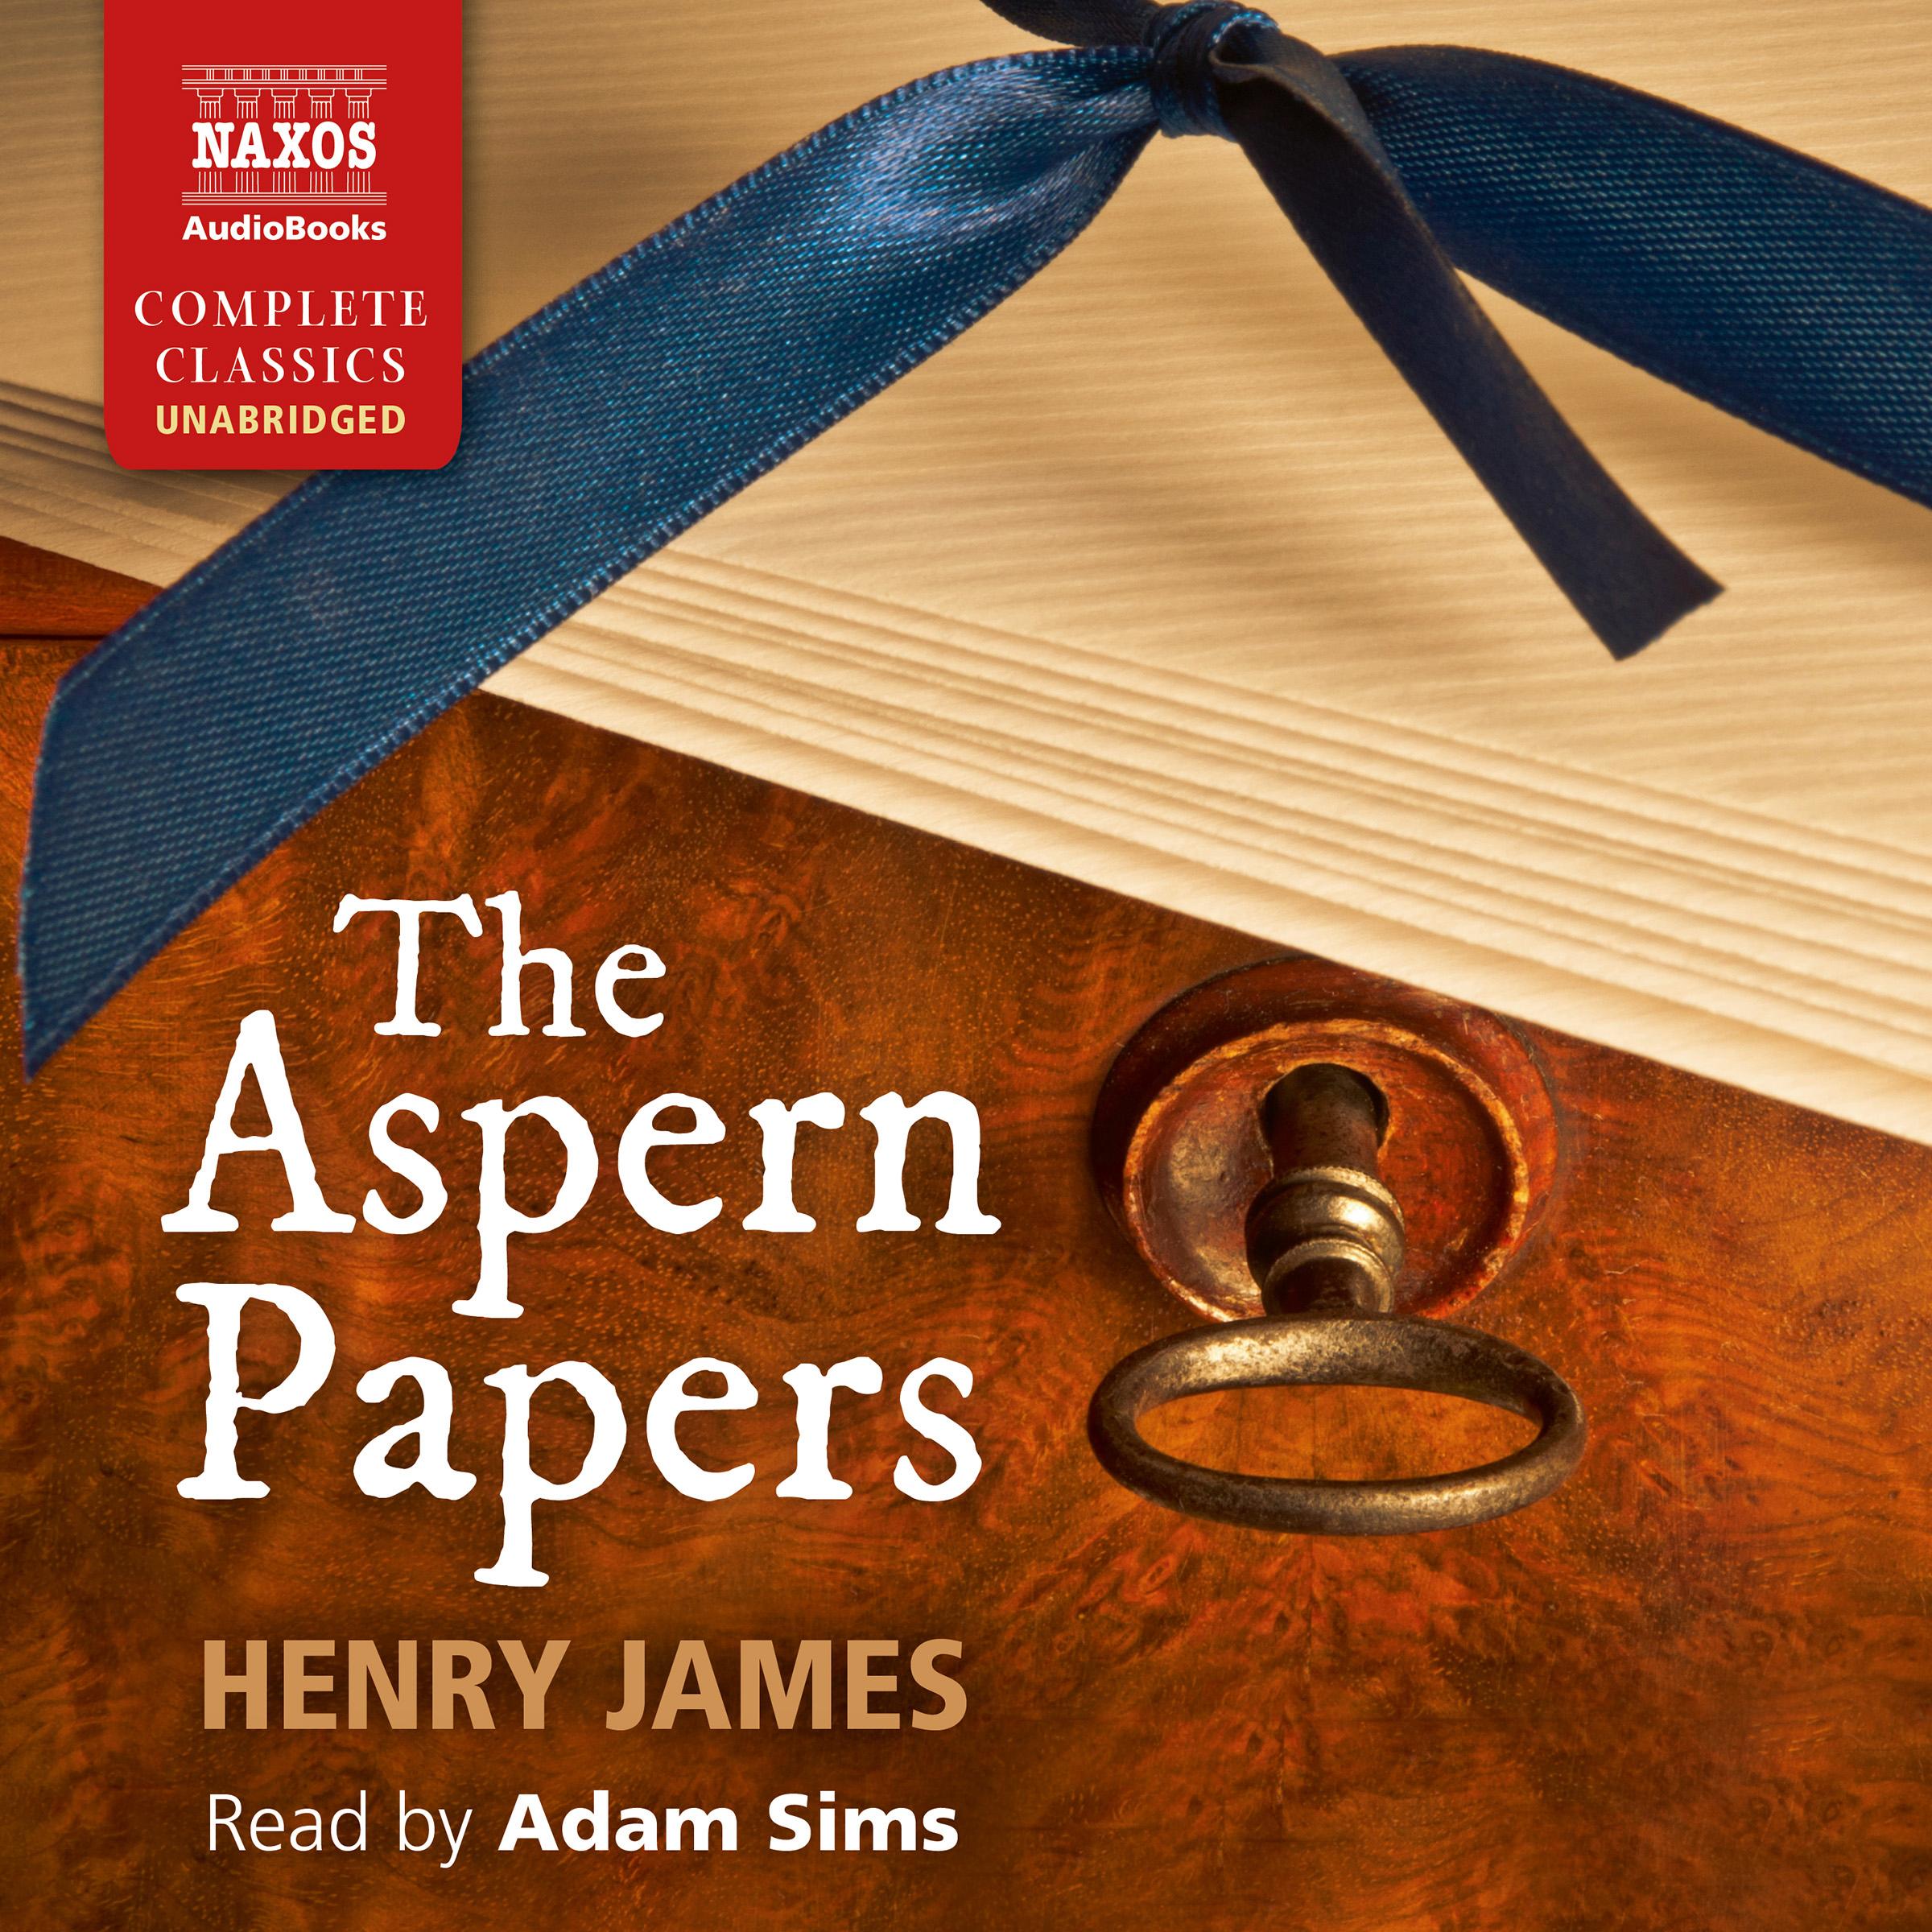 The Aspern Papers (Unabridged)